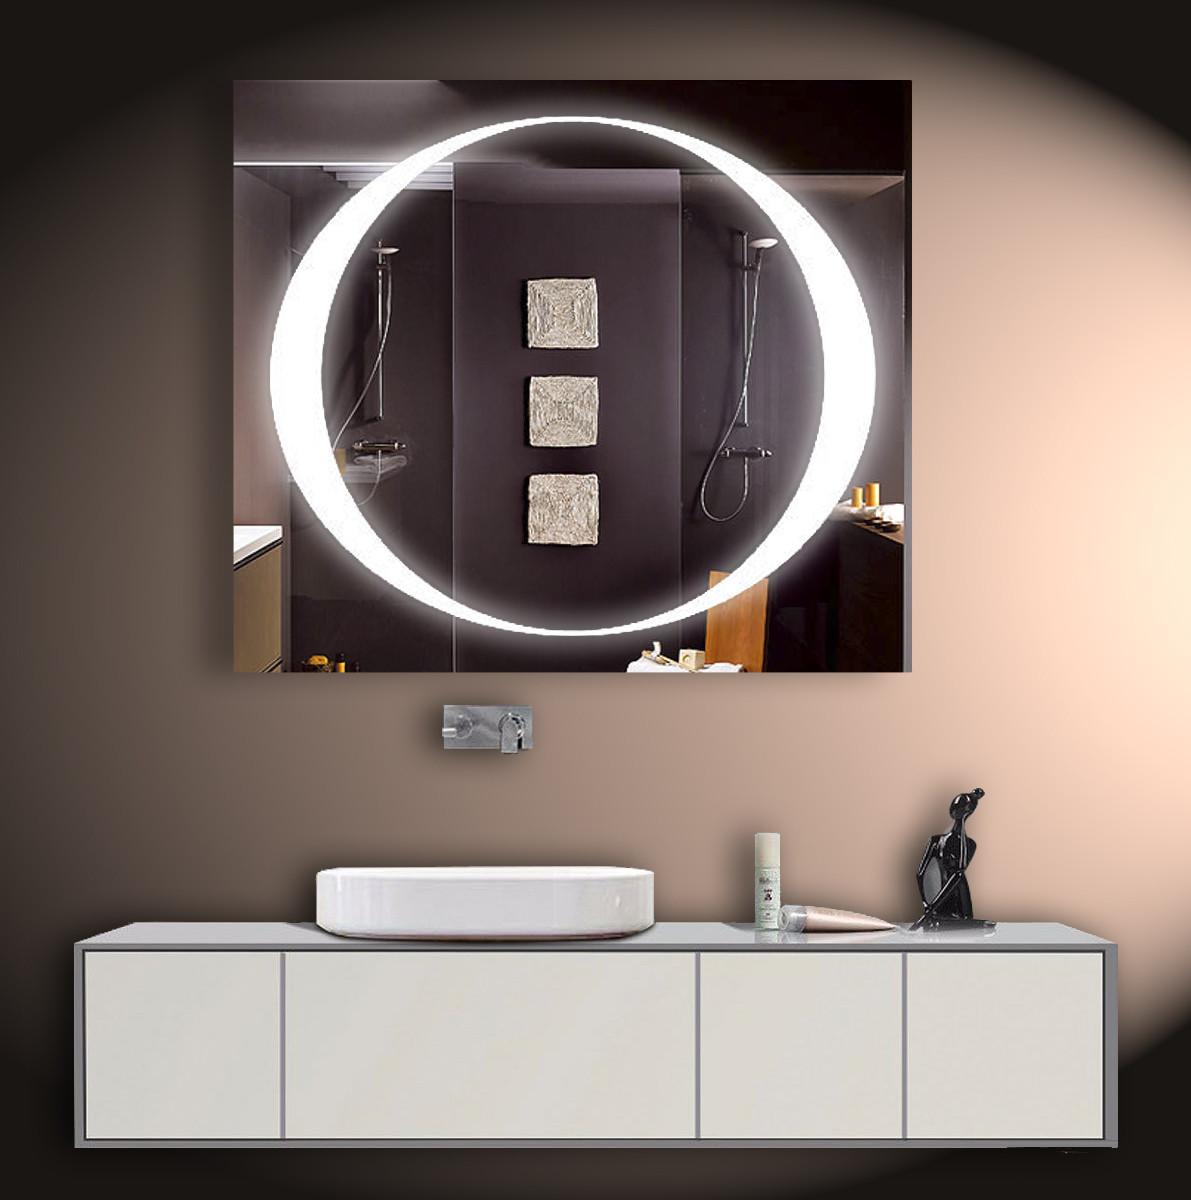 Зеркало LED со светодиодной подсветкой ver-3080 800х700 мм